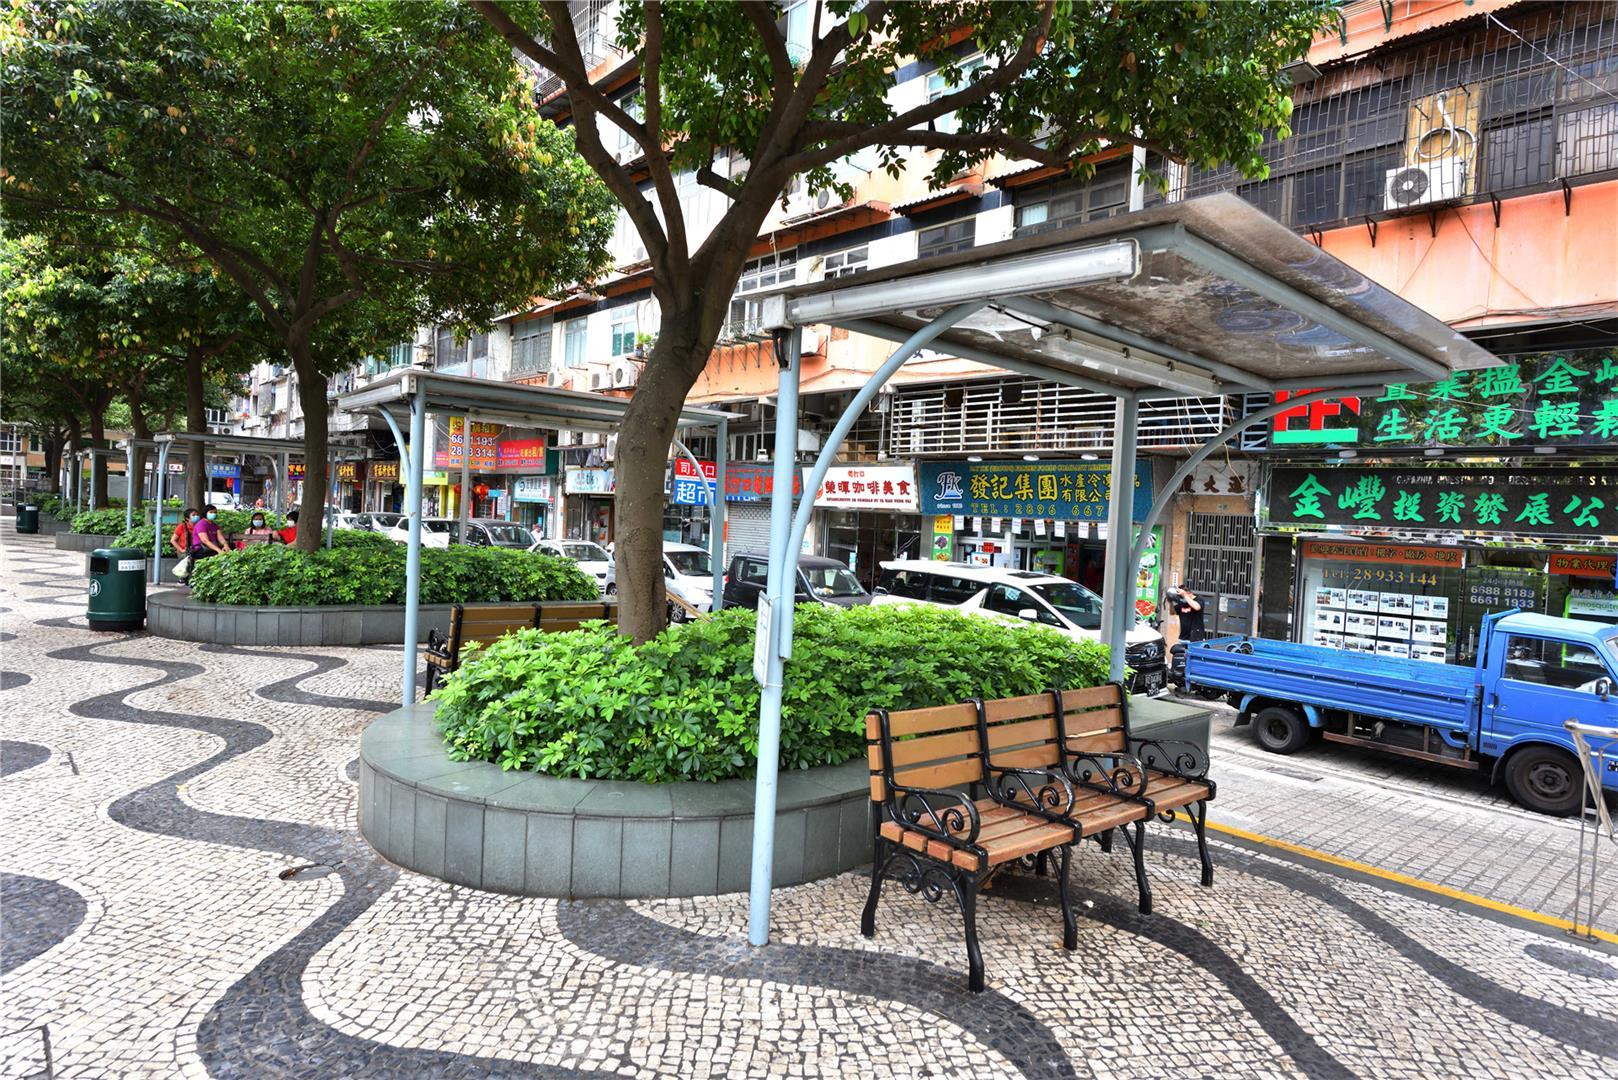 Leisure Area in Praça de Ponte e Horta